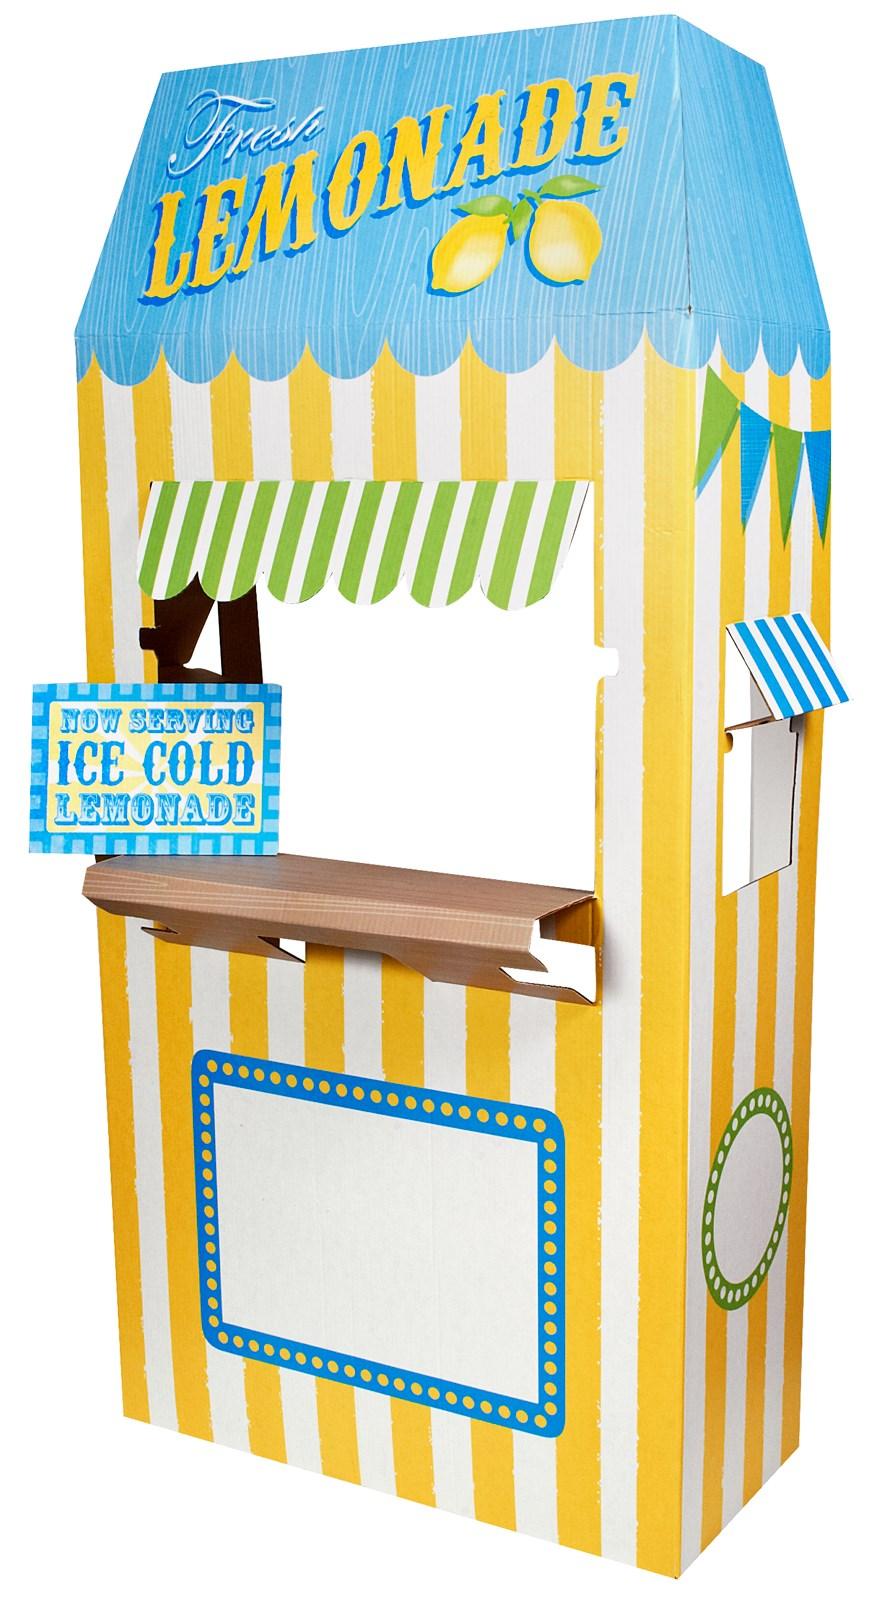 Lemonade Cardboard Stand - 6' Tall | BirthdayExpress.com